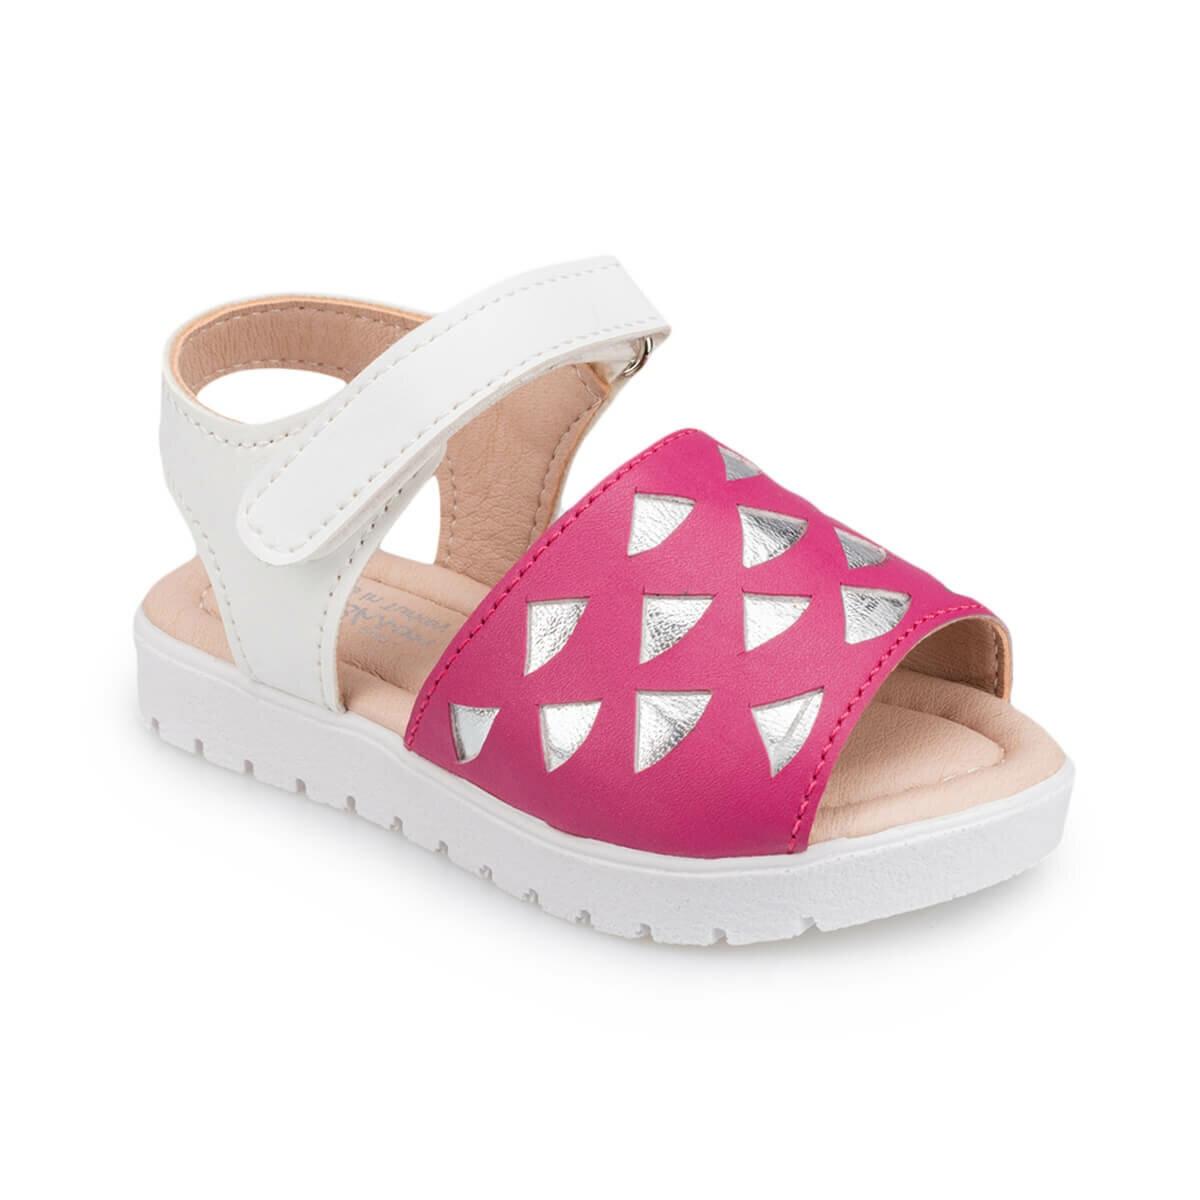 FLO 91.511047.B Fuchsia Girls Child Sandals Polaris